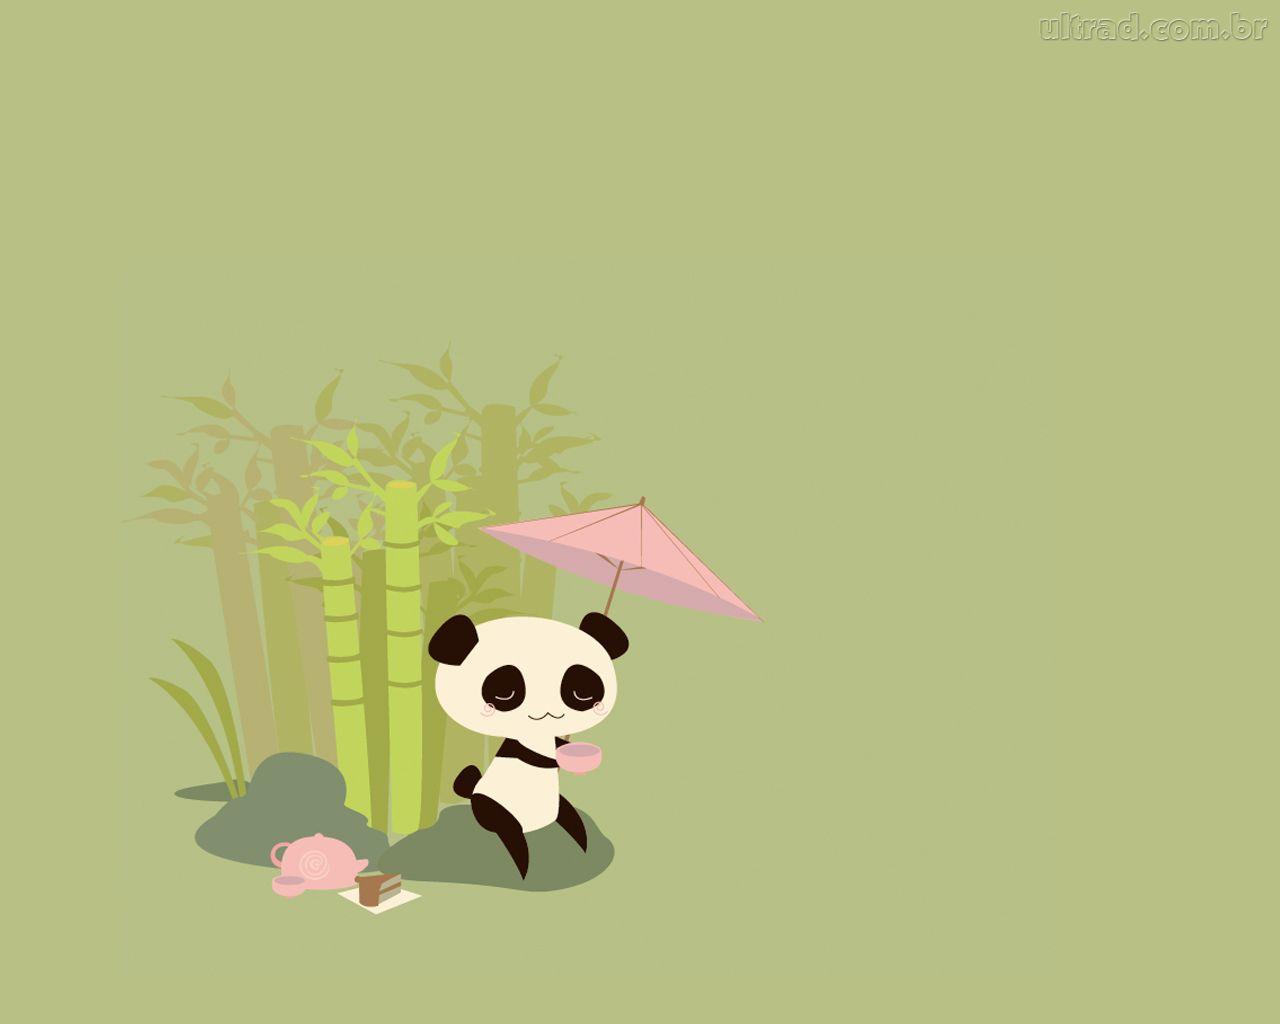 Pororo Cute Wallpaper Netkids Ursinhos Teddies